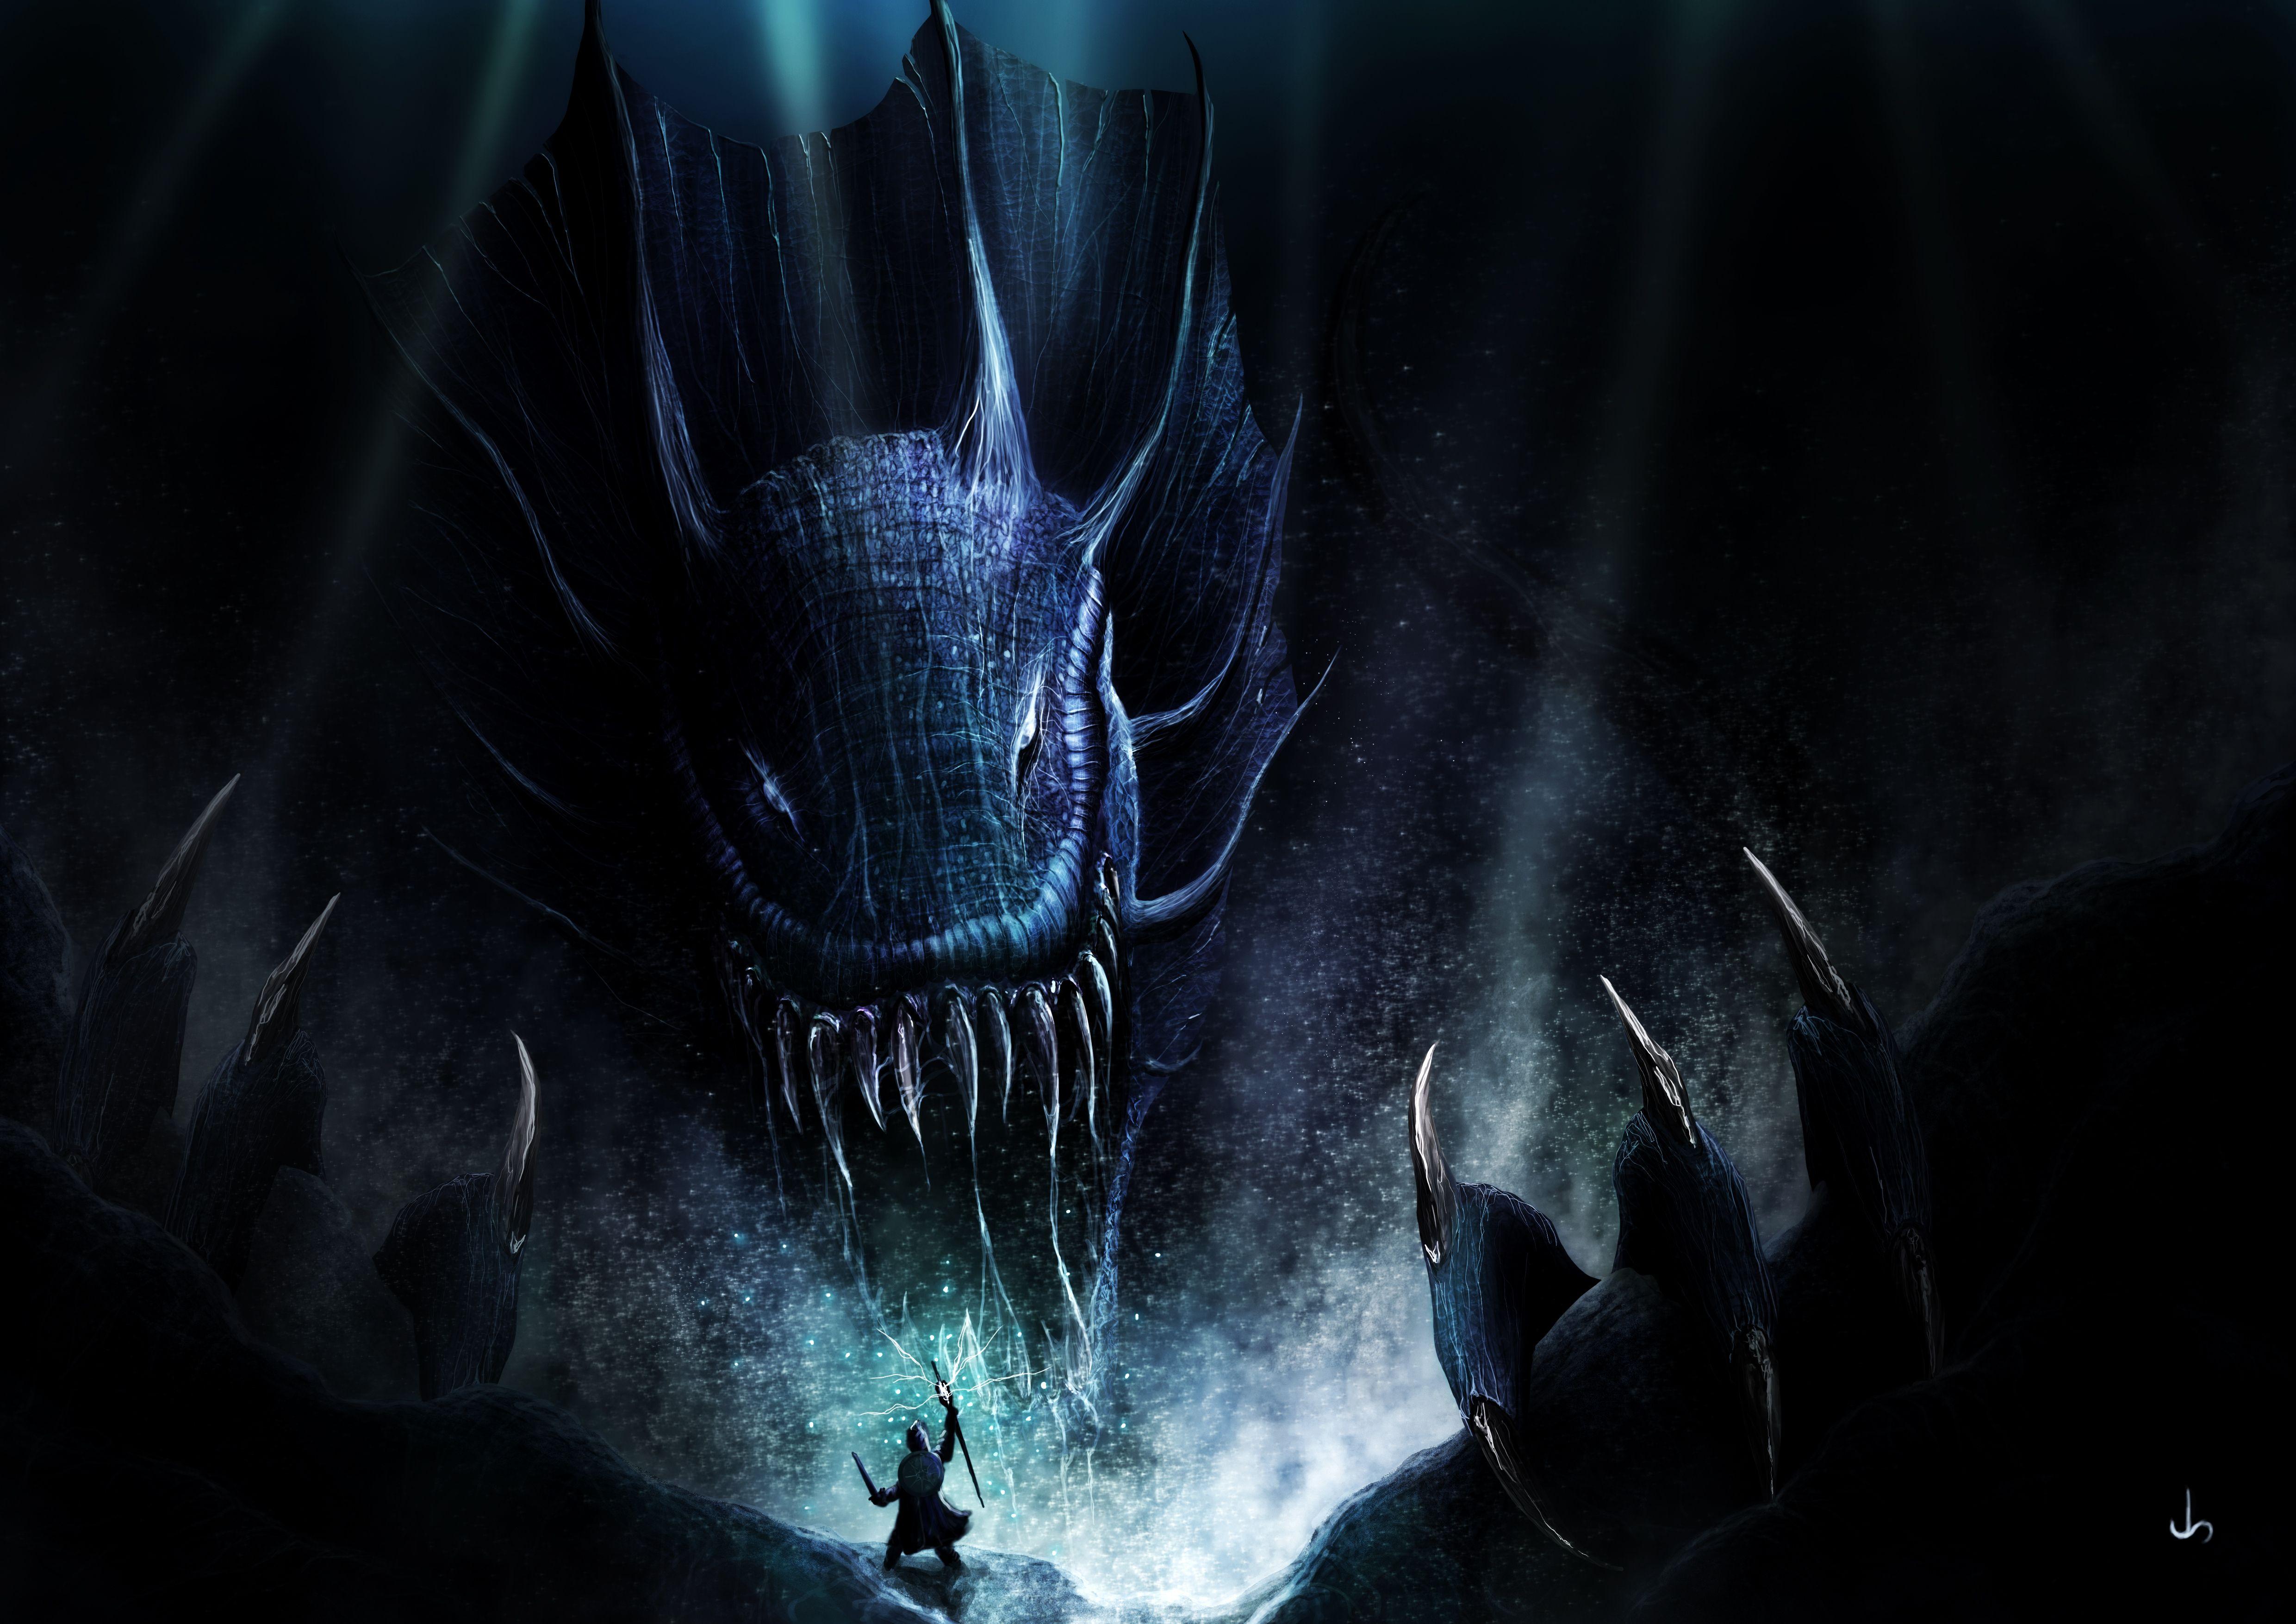 Final Fantasy Xv Wallpaper Iphone X Drachen 4k Ultra Hd Wallpaper Hintergrund 4961x3508